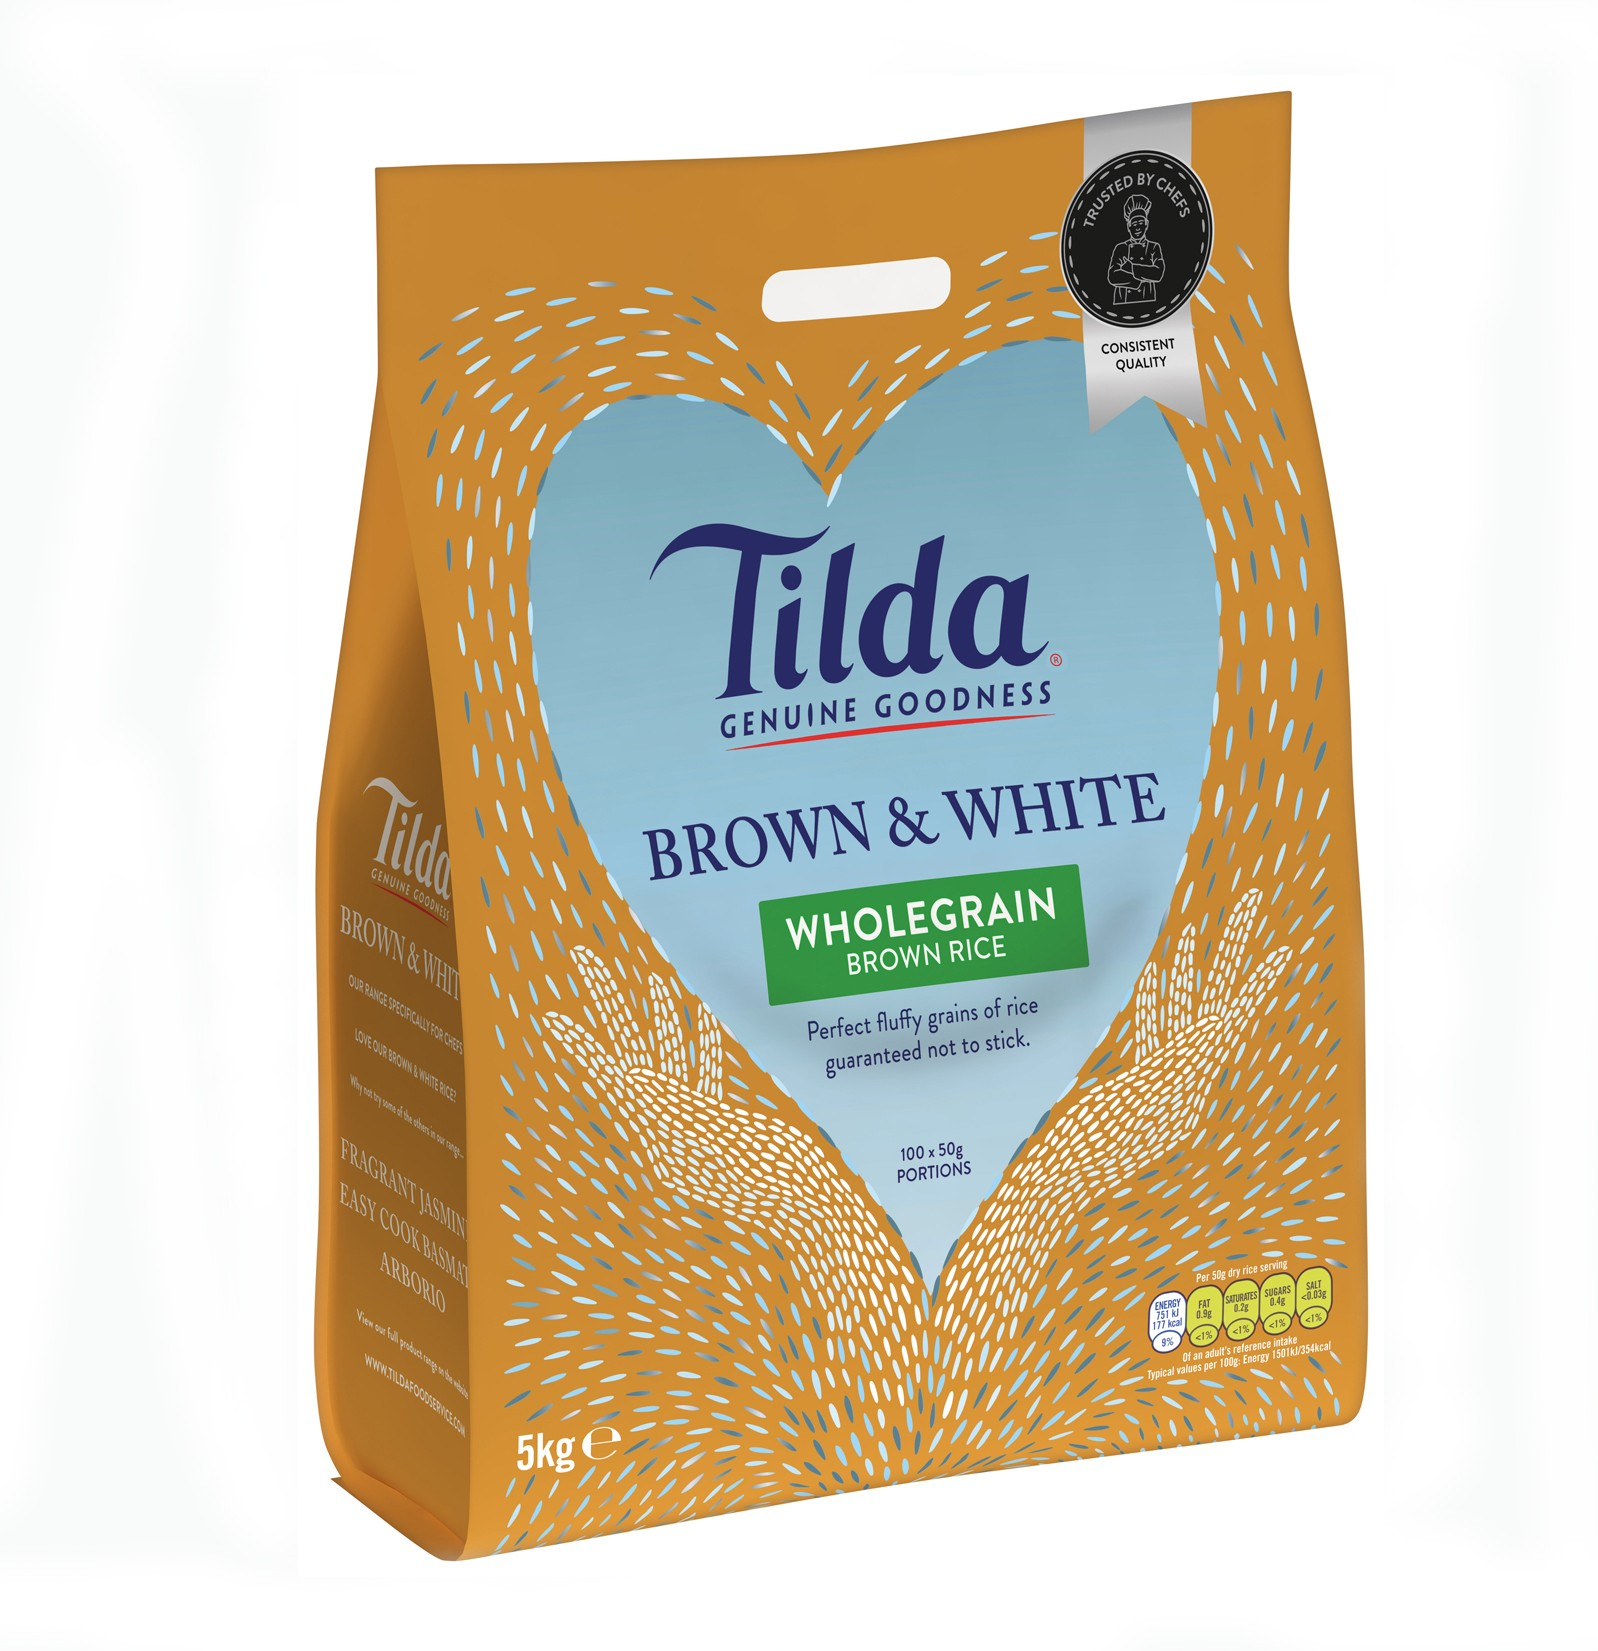 Tilda Brown & White Rice